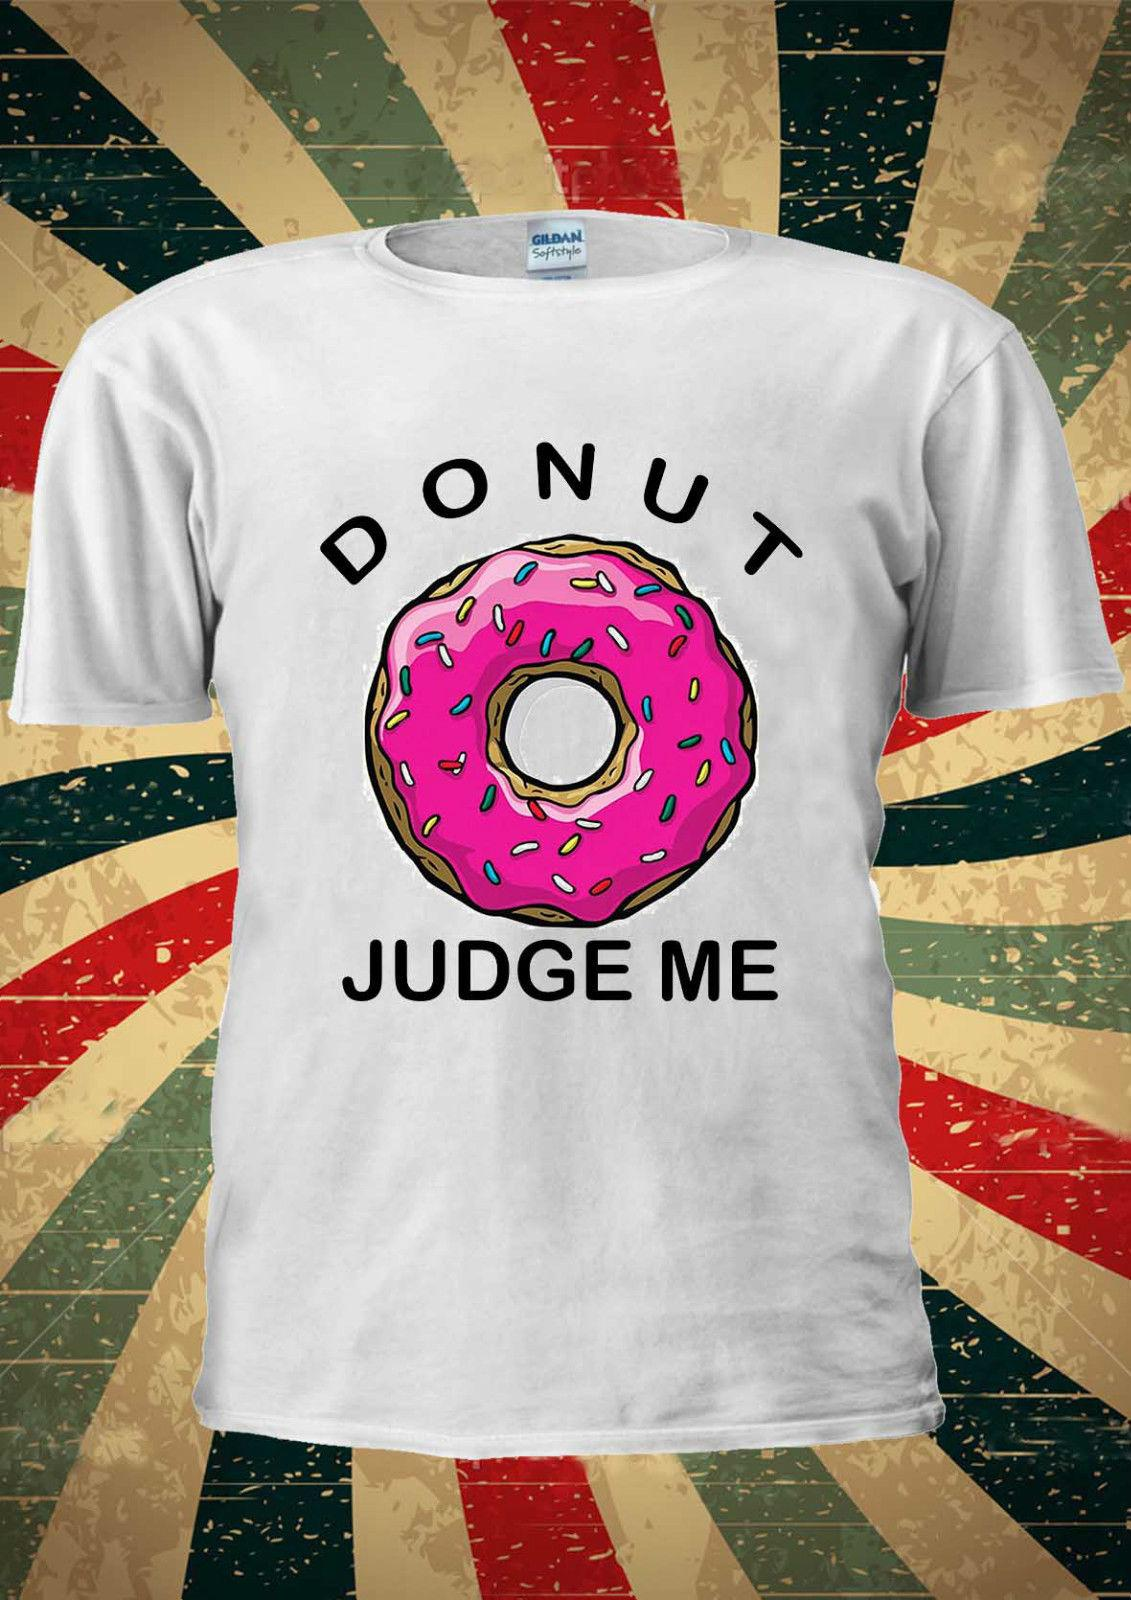 94f46bef Donut Judge Me Doughnut T Shirt Vest Top Men Women Unisex 1885 ...